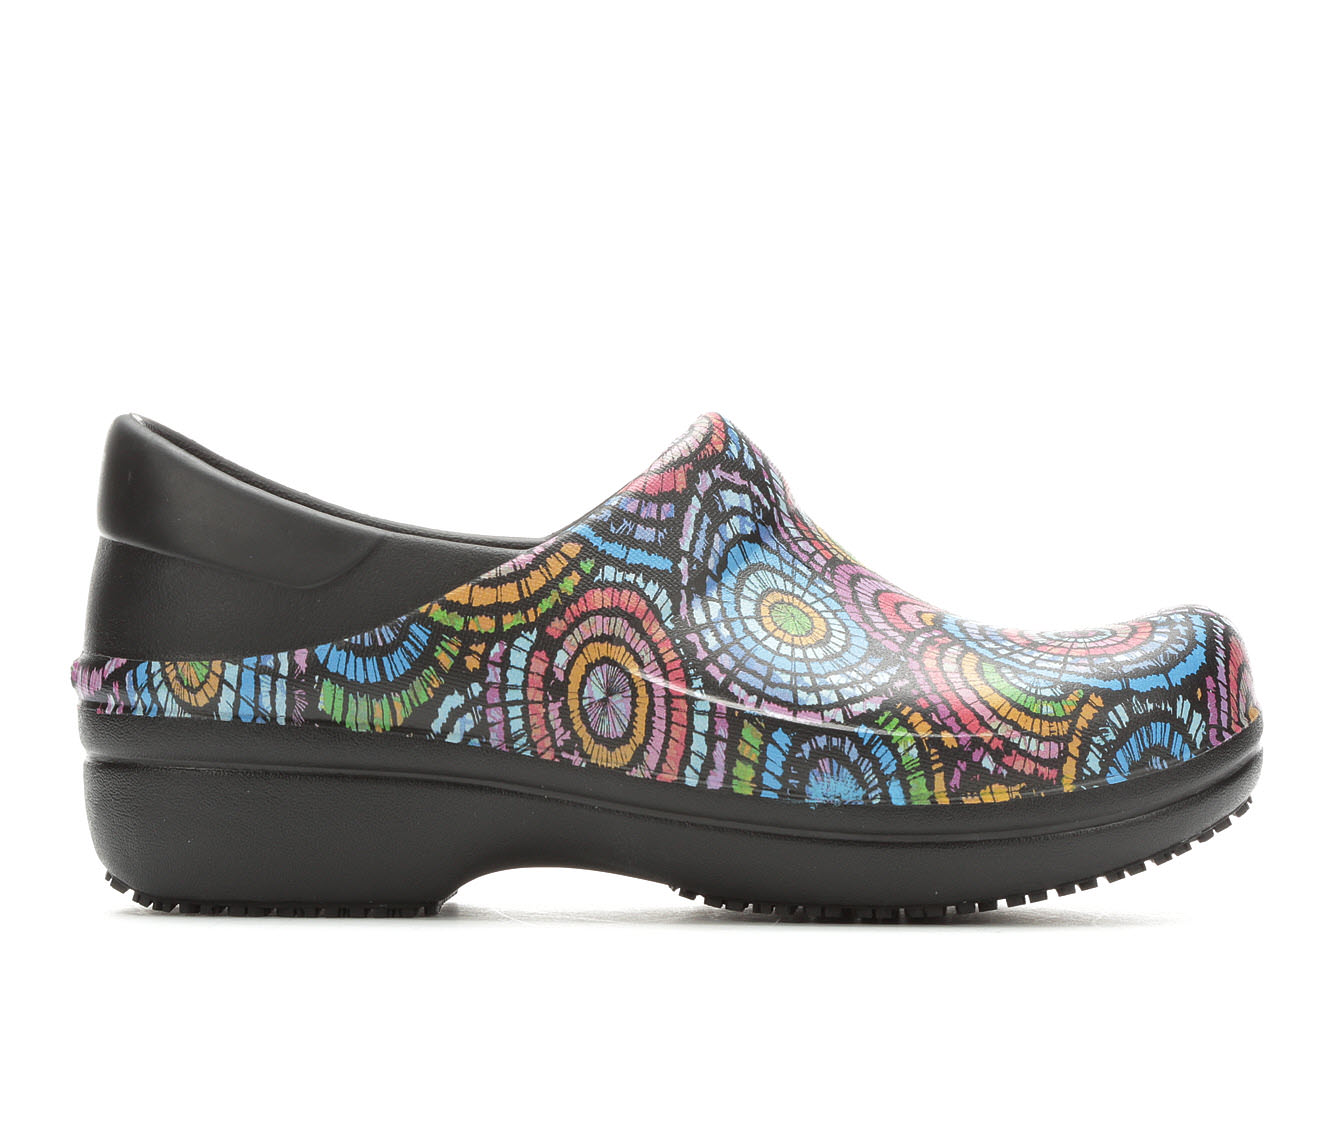 Crocs Work Neria Pro II Graphic Men's Boots (Black Faux Leather)